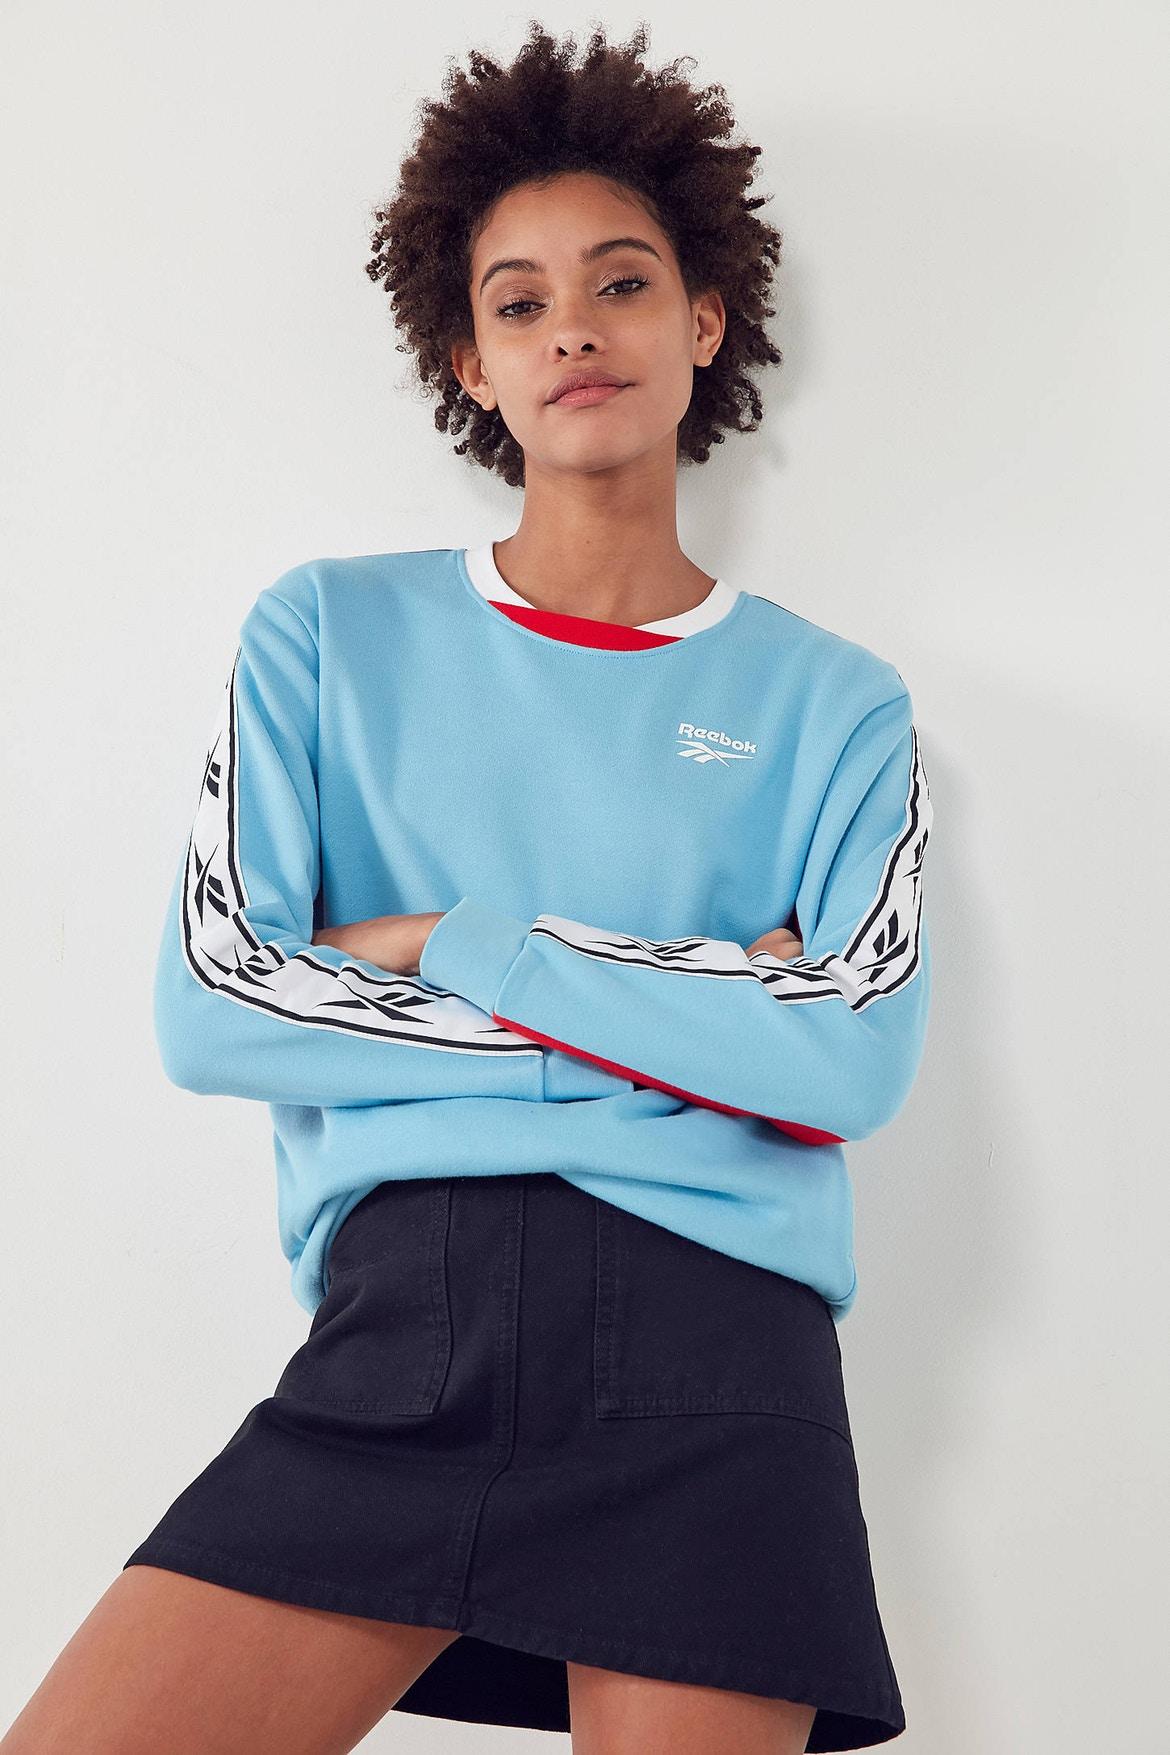 http-bae.hypebeast.comfiles201707reebok-urban-outfitters-vector-sweatshirt-blue-4